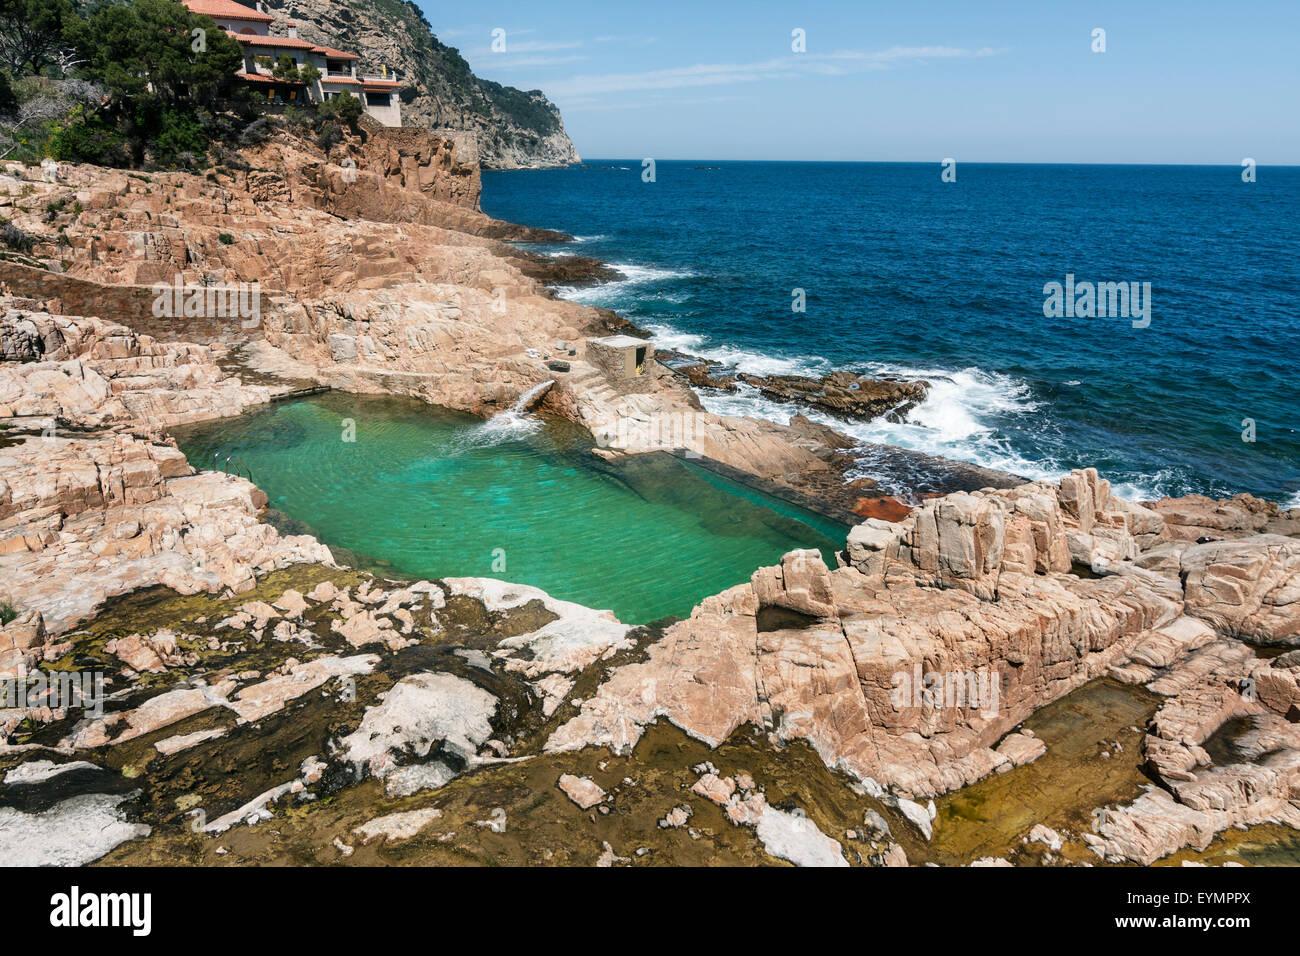 Natural swimming pool es cau begur stock photo royalty for Piscina natural begur